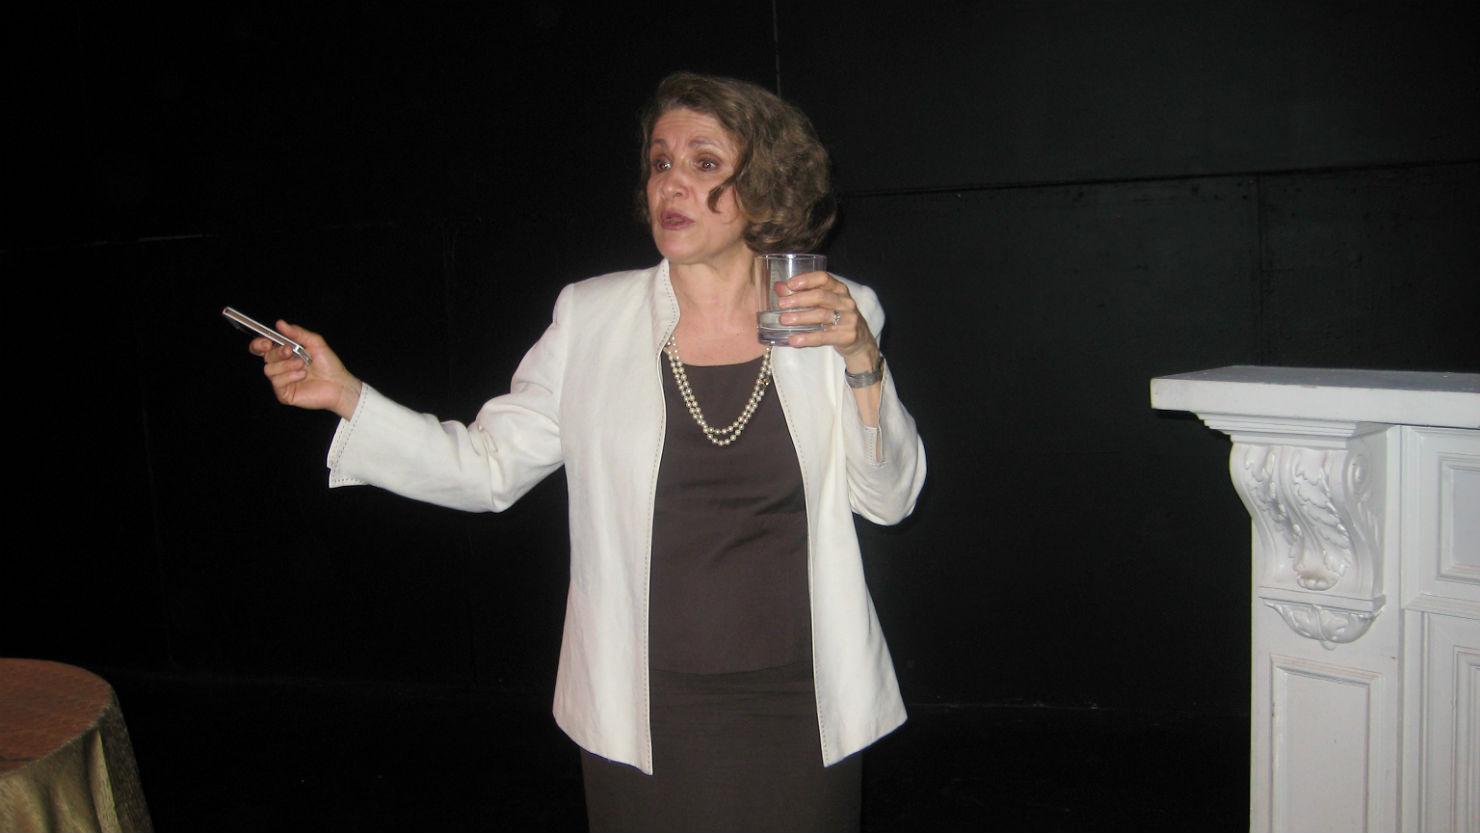 FAR NORTH,Gallery Players Black Box Festival, NYC.(Mary Leggio;dir. Norma Medina)